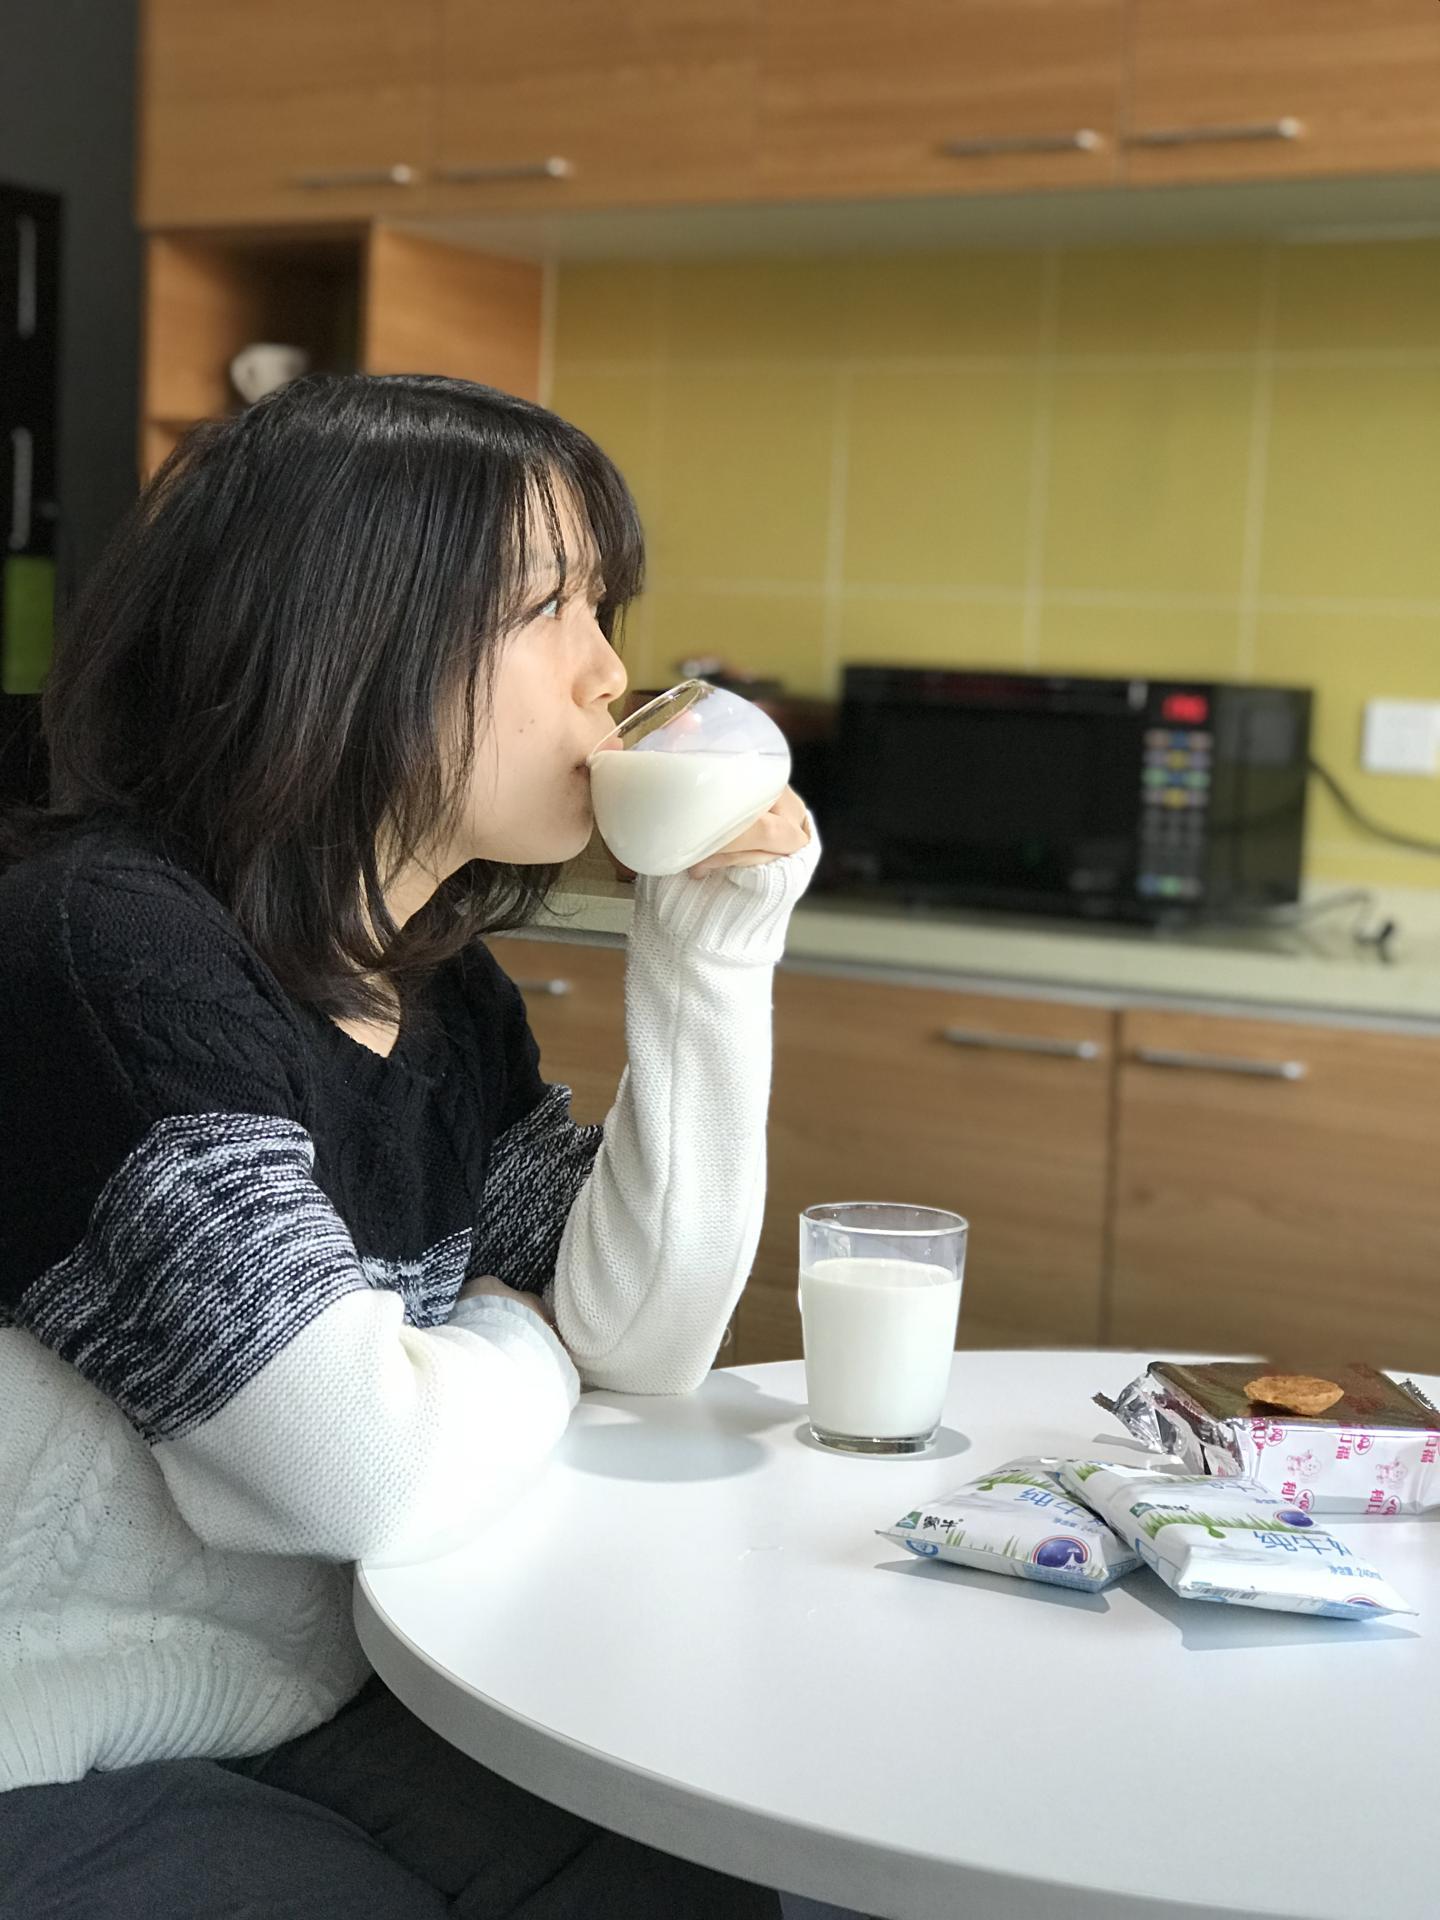 Milk Drinking in China